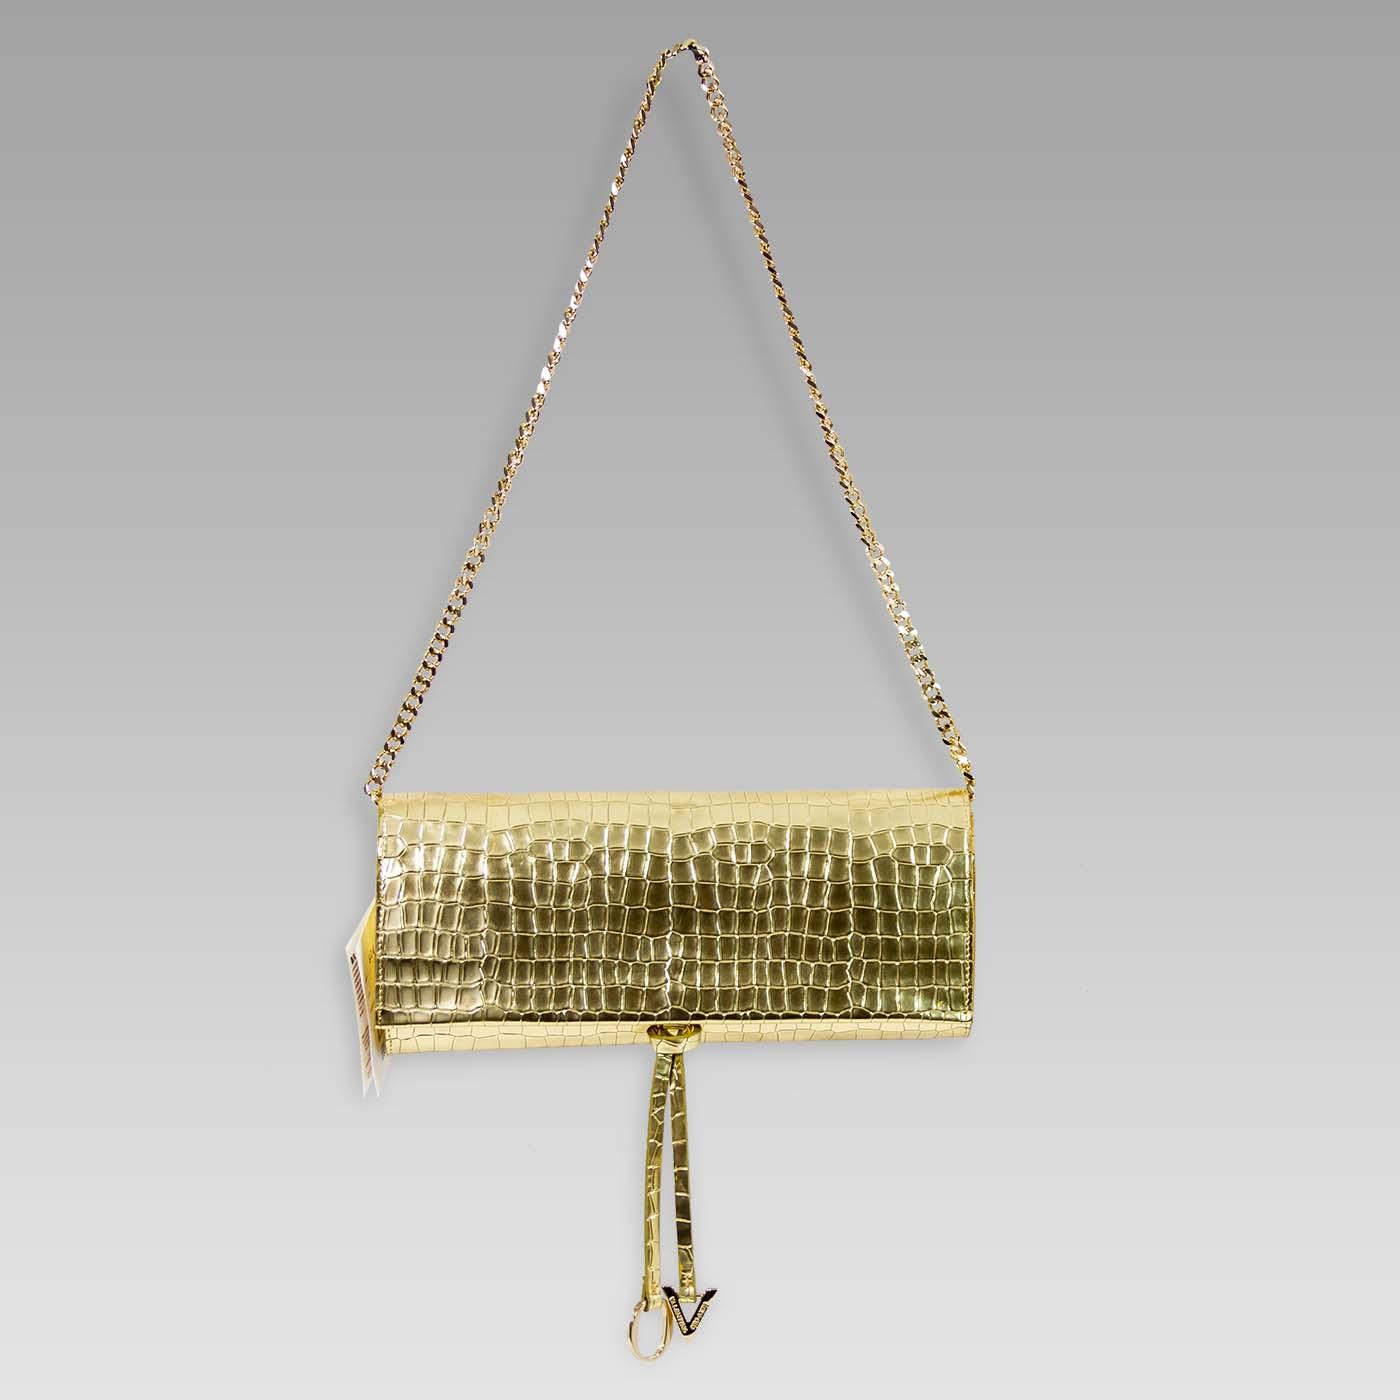 Valentino_Orlandi_Envelope_Clutch_Purse_Gold_Croc_Embossed_Leather_Bag_01VO6210CLGL_04.jpg